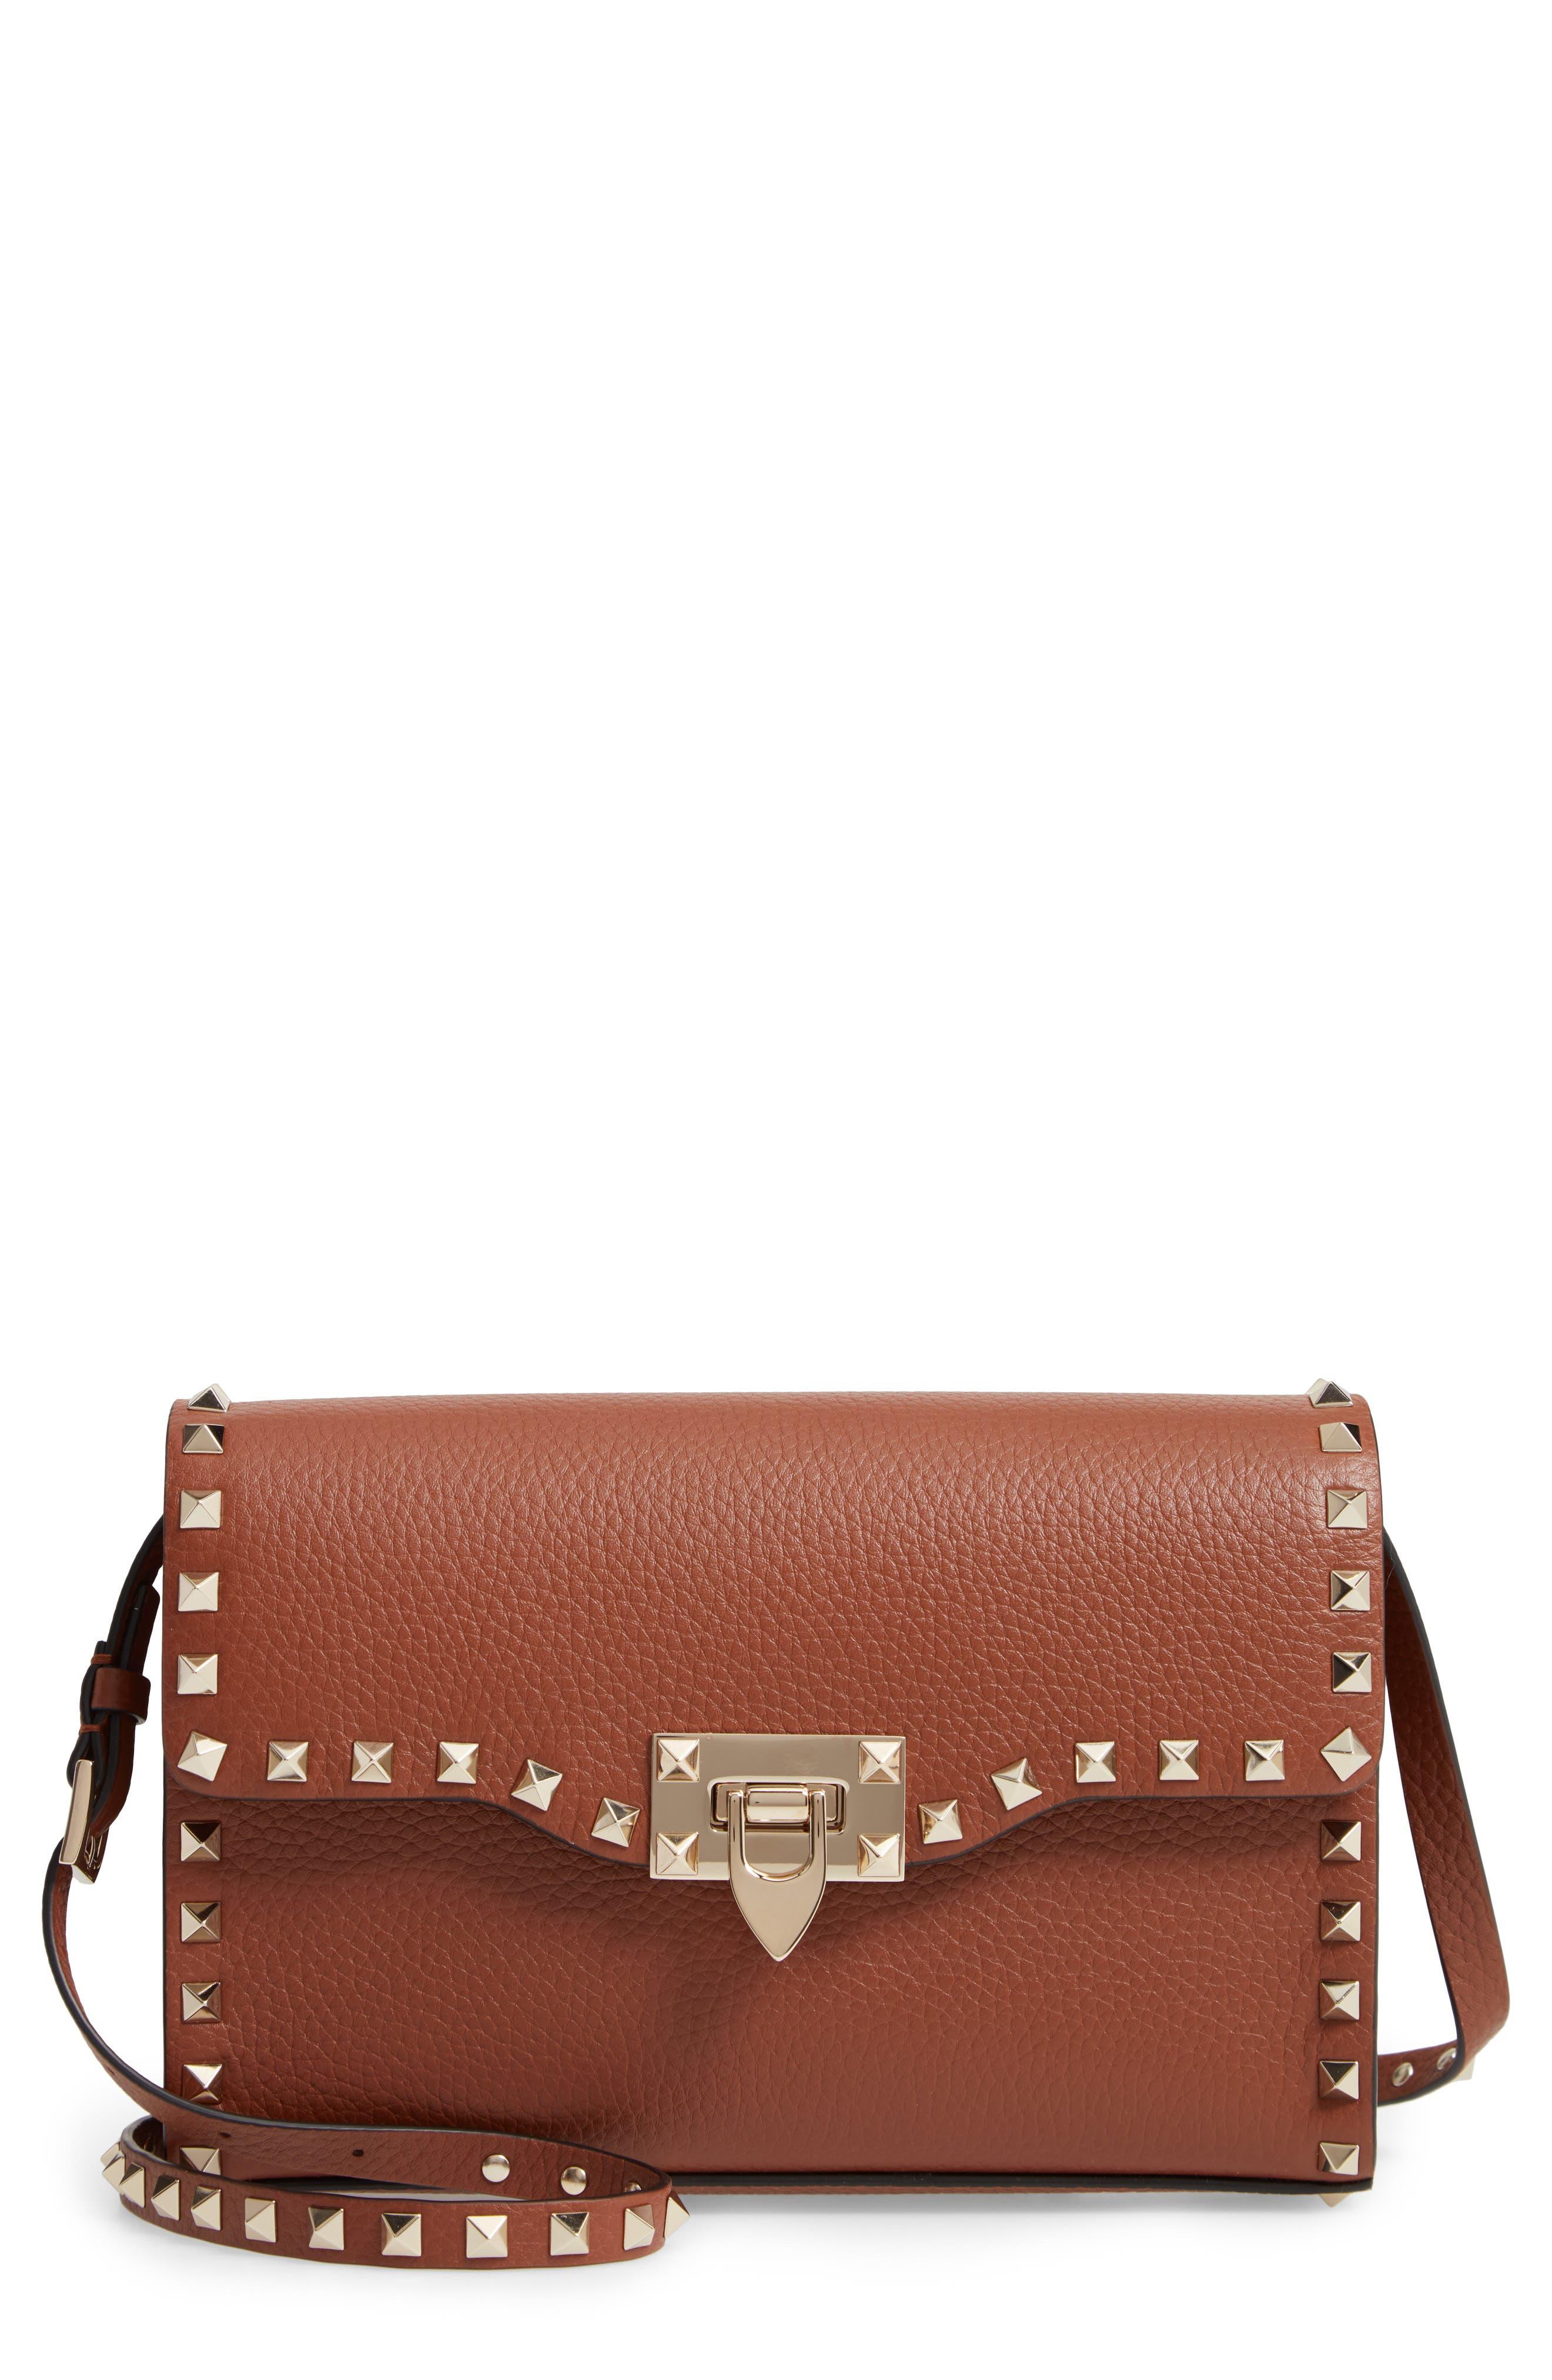 VALENTINO GARAVANI Medium Rockstud Leather Crossbody Bag, Main, color, BRIGHT COGNAC